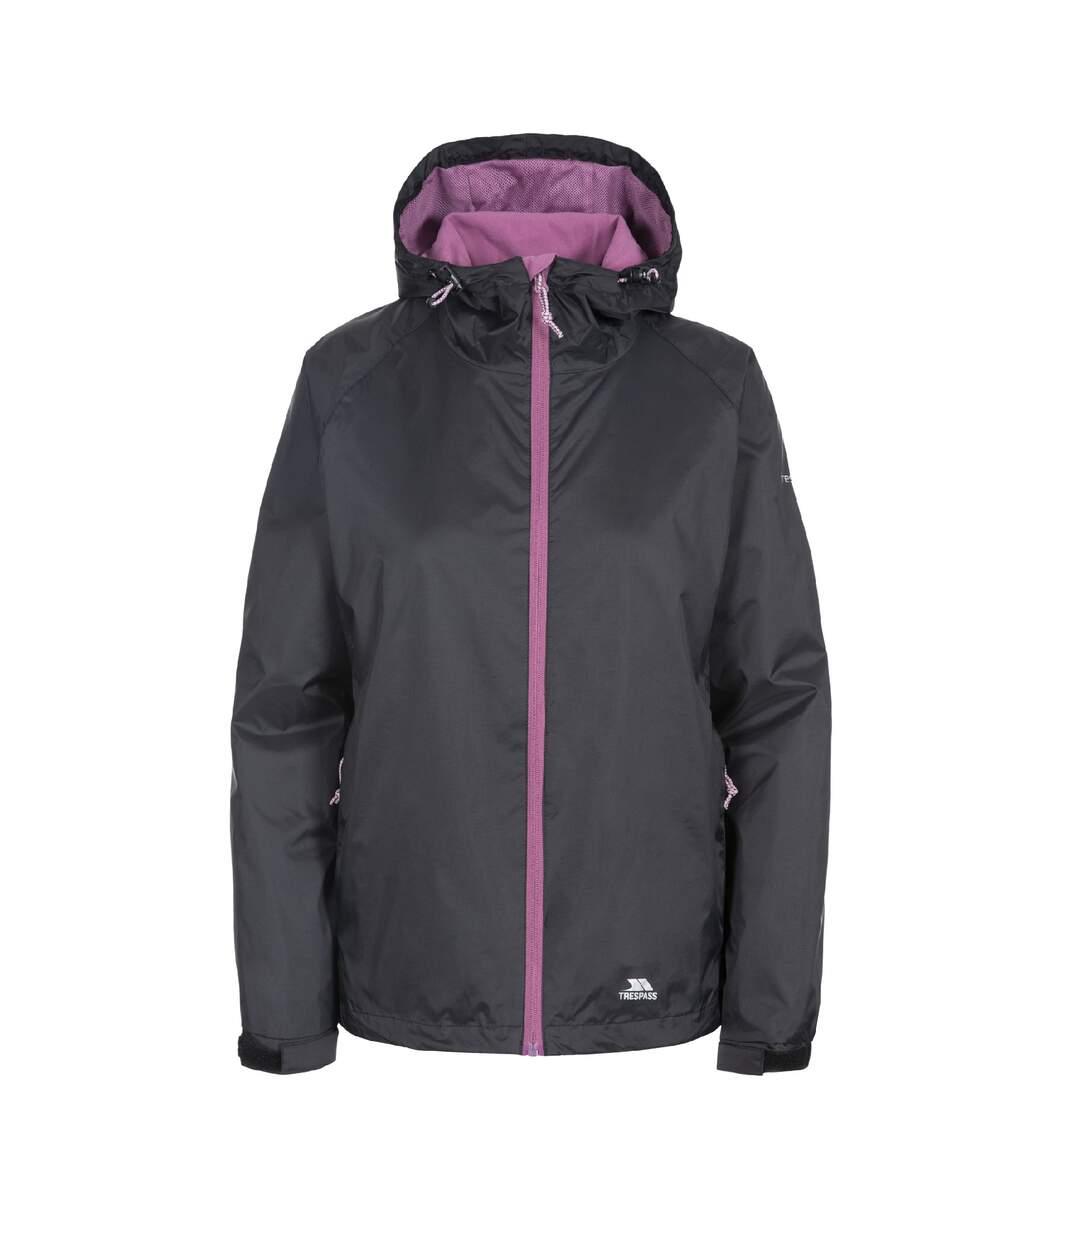 Trespass Womens/Ladies Tayah II Waterproof Shell Jacket (Black) - UTTP3378